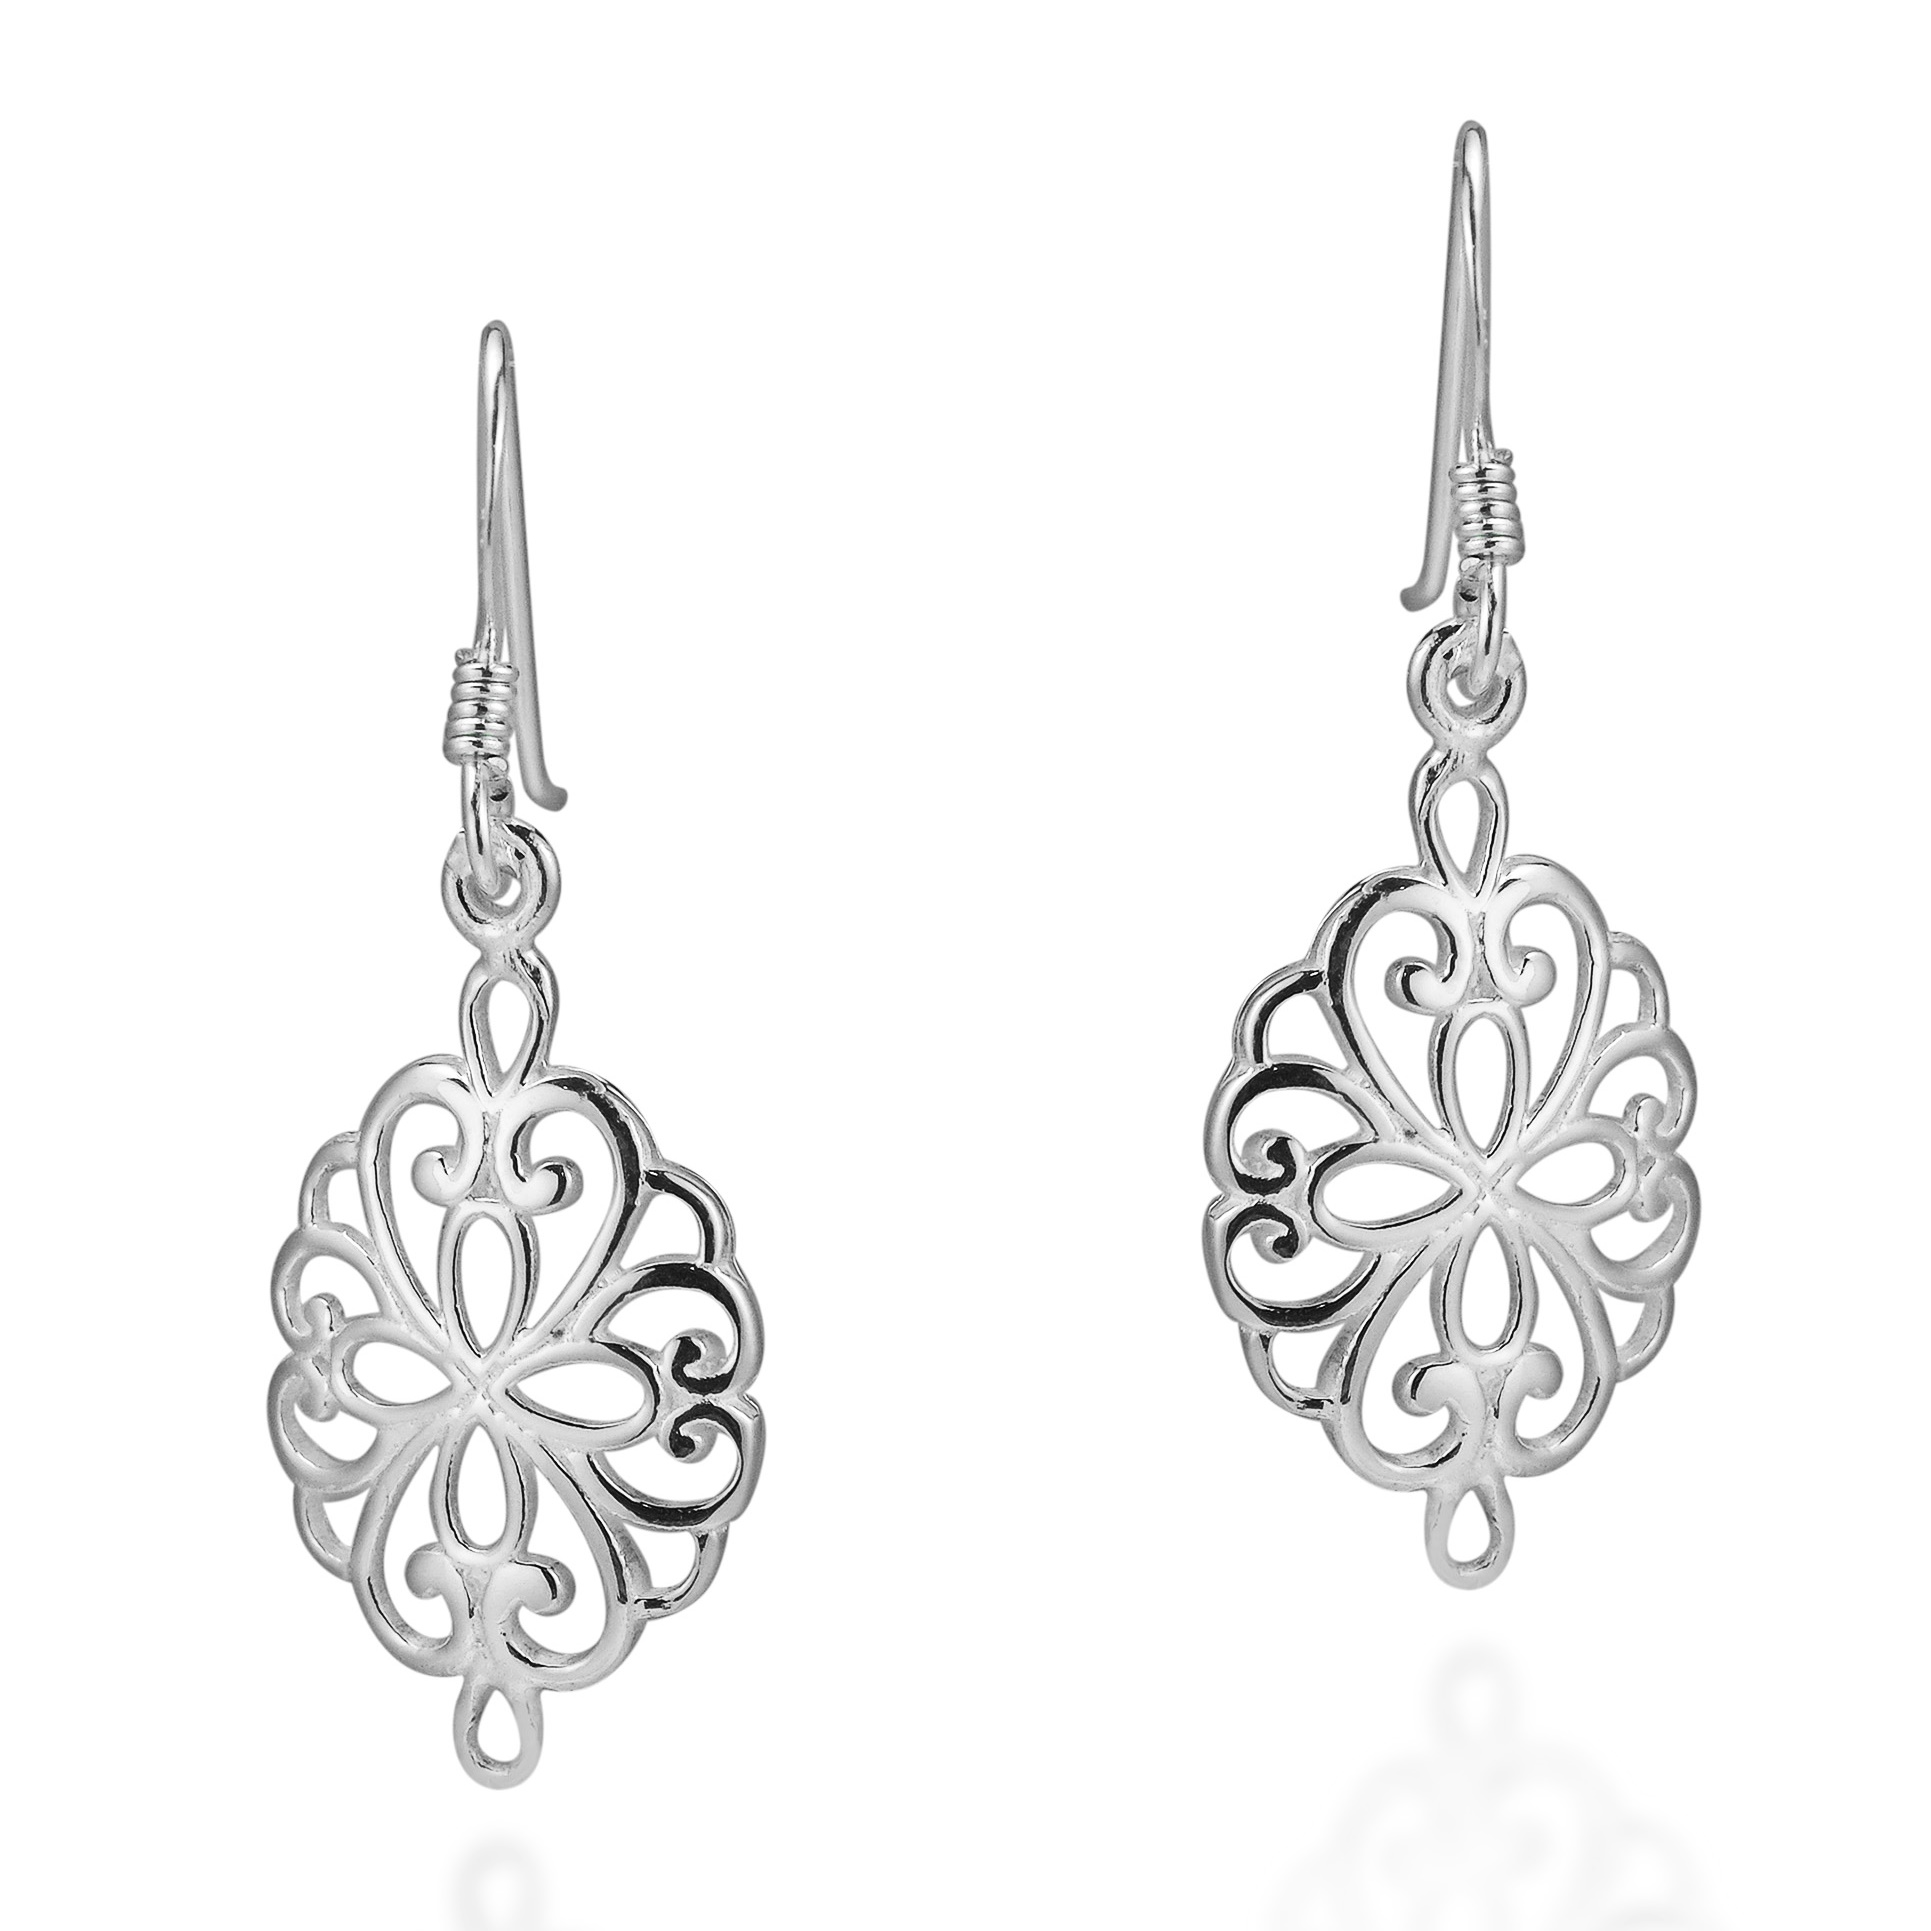 Timeless elegance filigree 925 sterling silver dangle earrings timeless elegance filigree 925 sterling silver dangle earrings arubaitofo Images